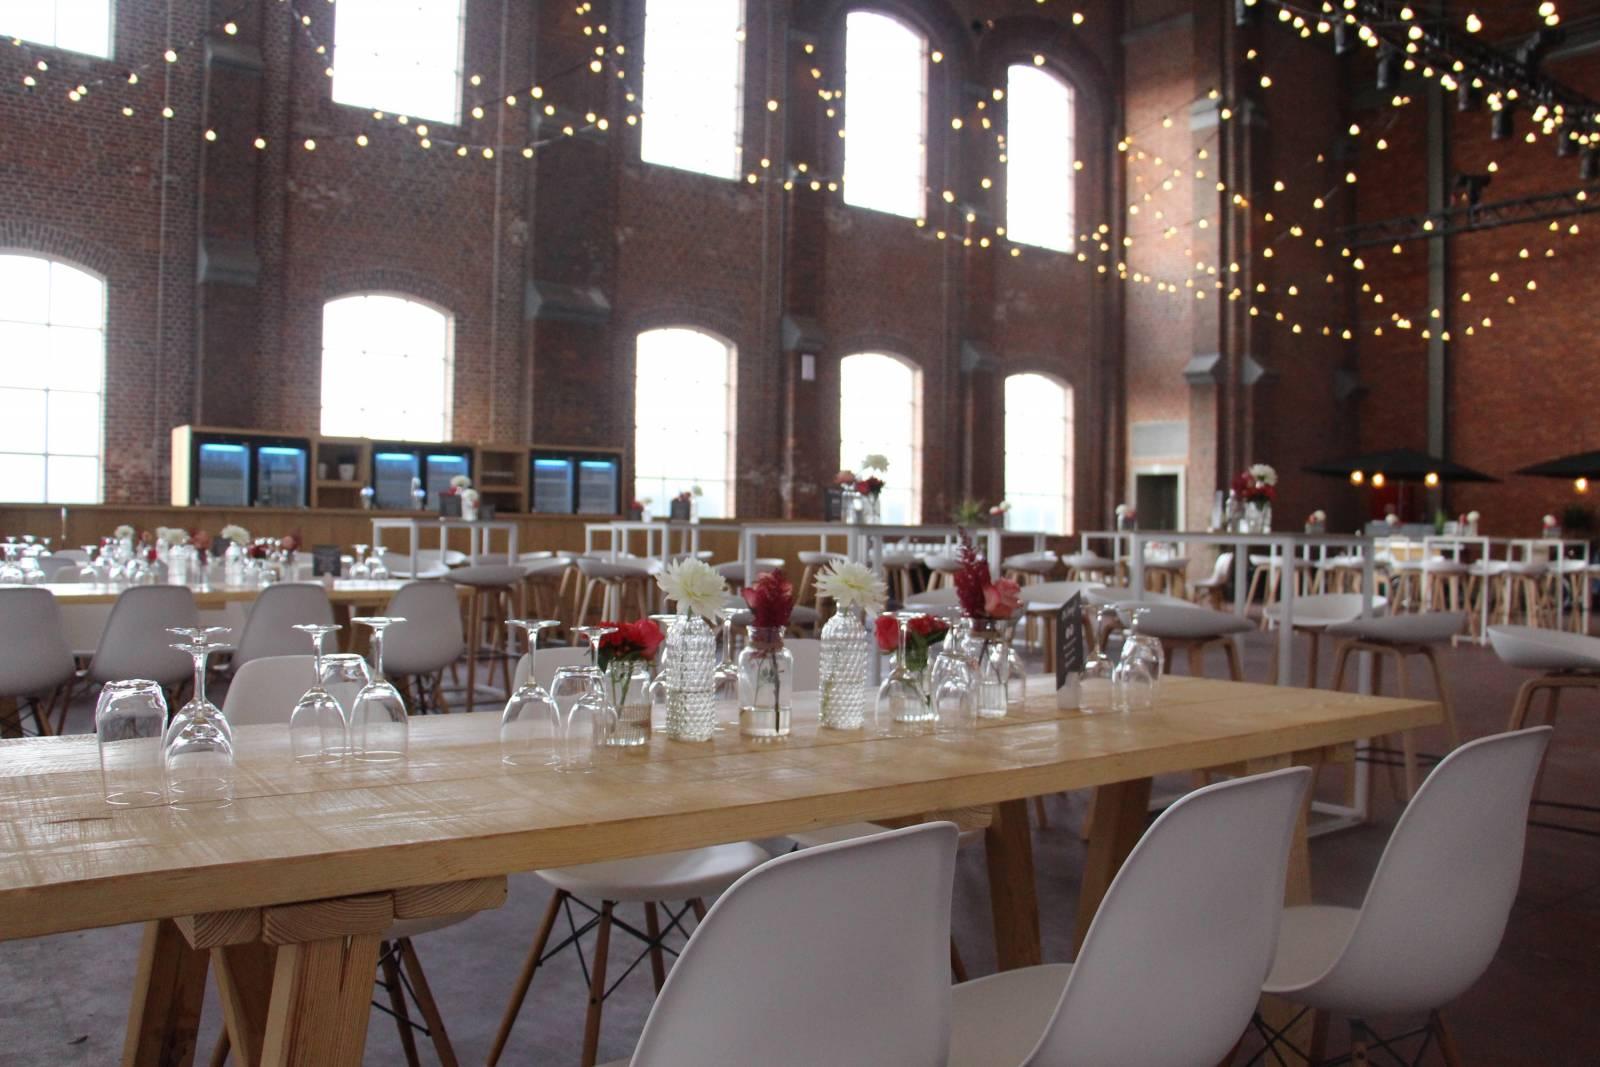 Hangar 43 - Feestzaal Oost-Vlaanderen - Industrieel - House of Weddings - 34